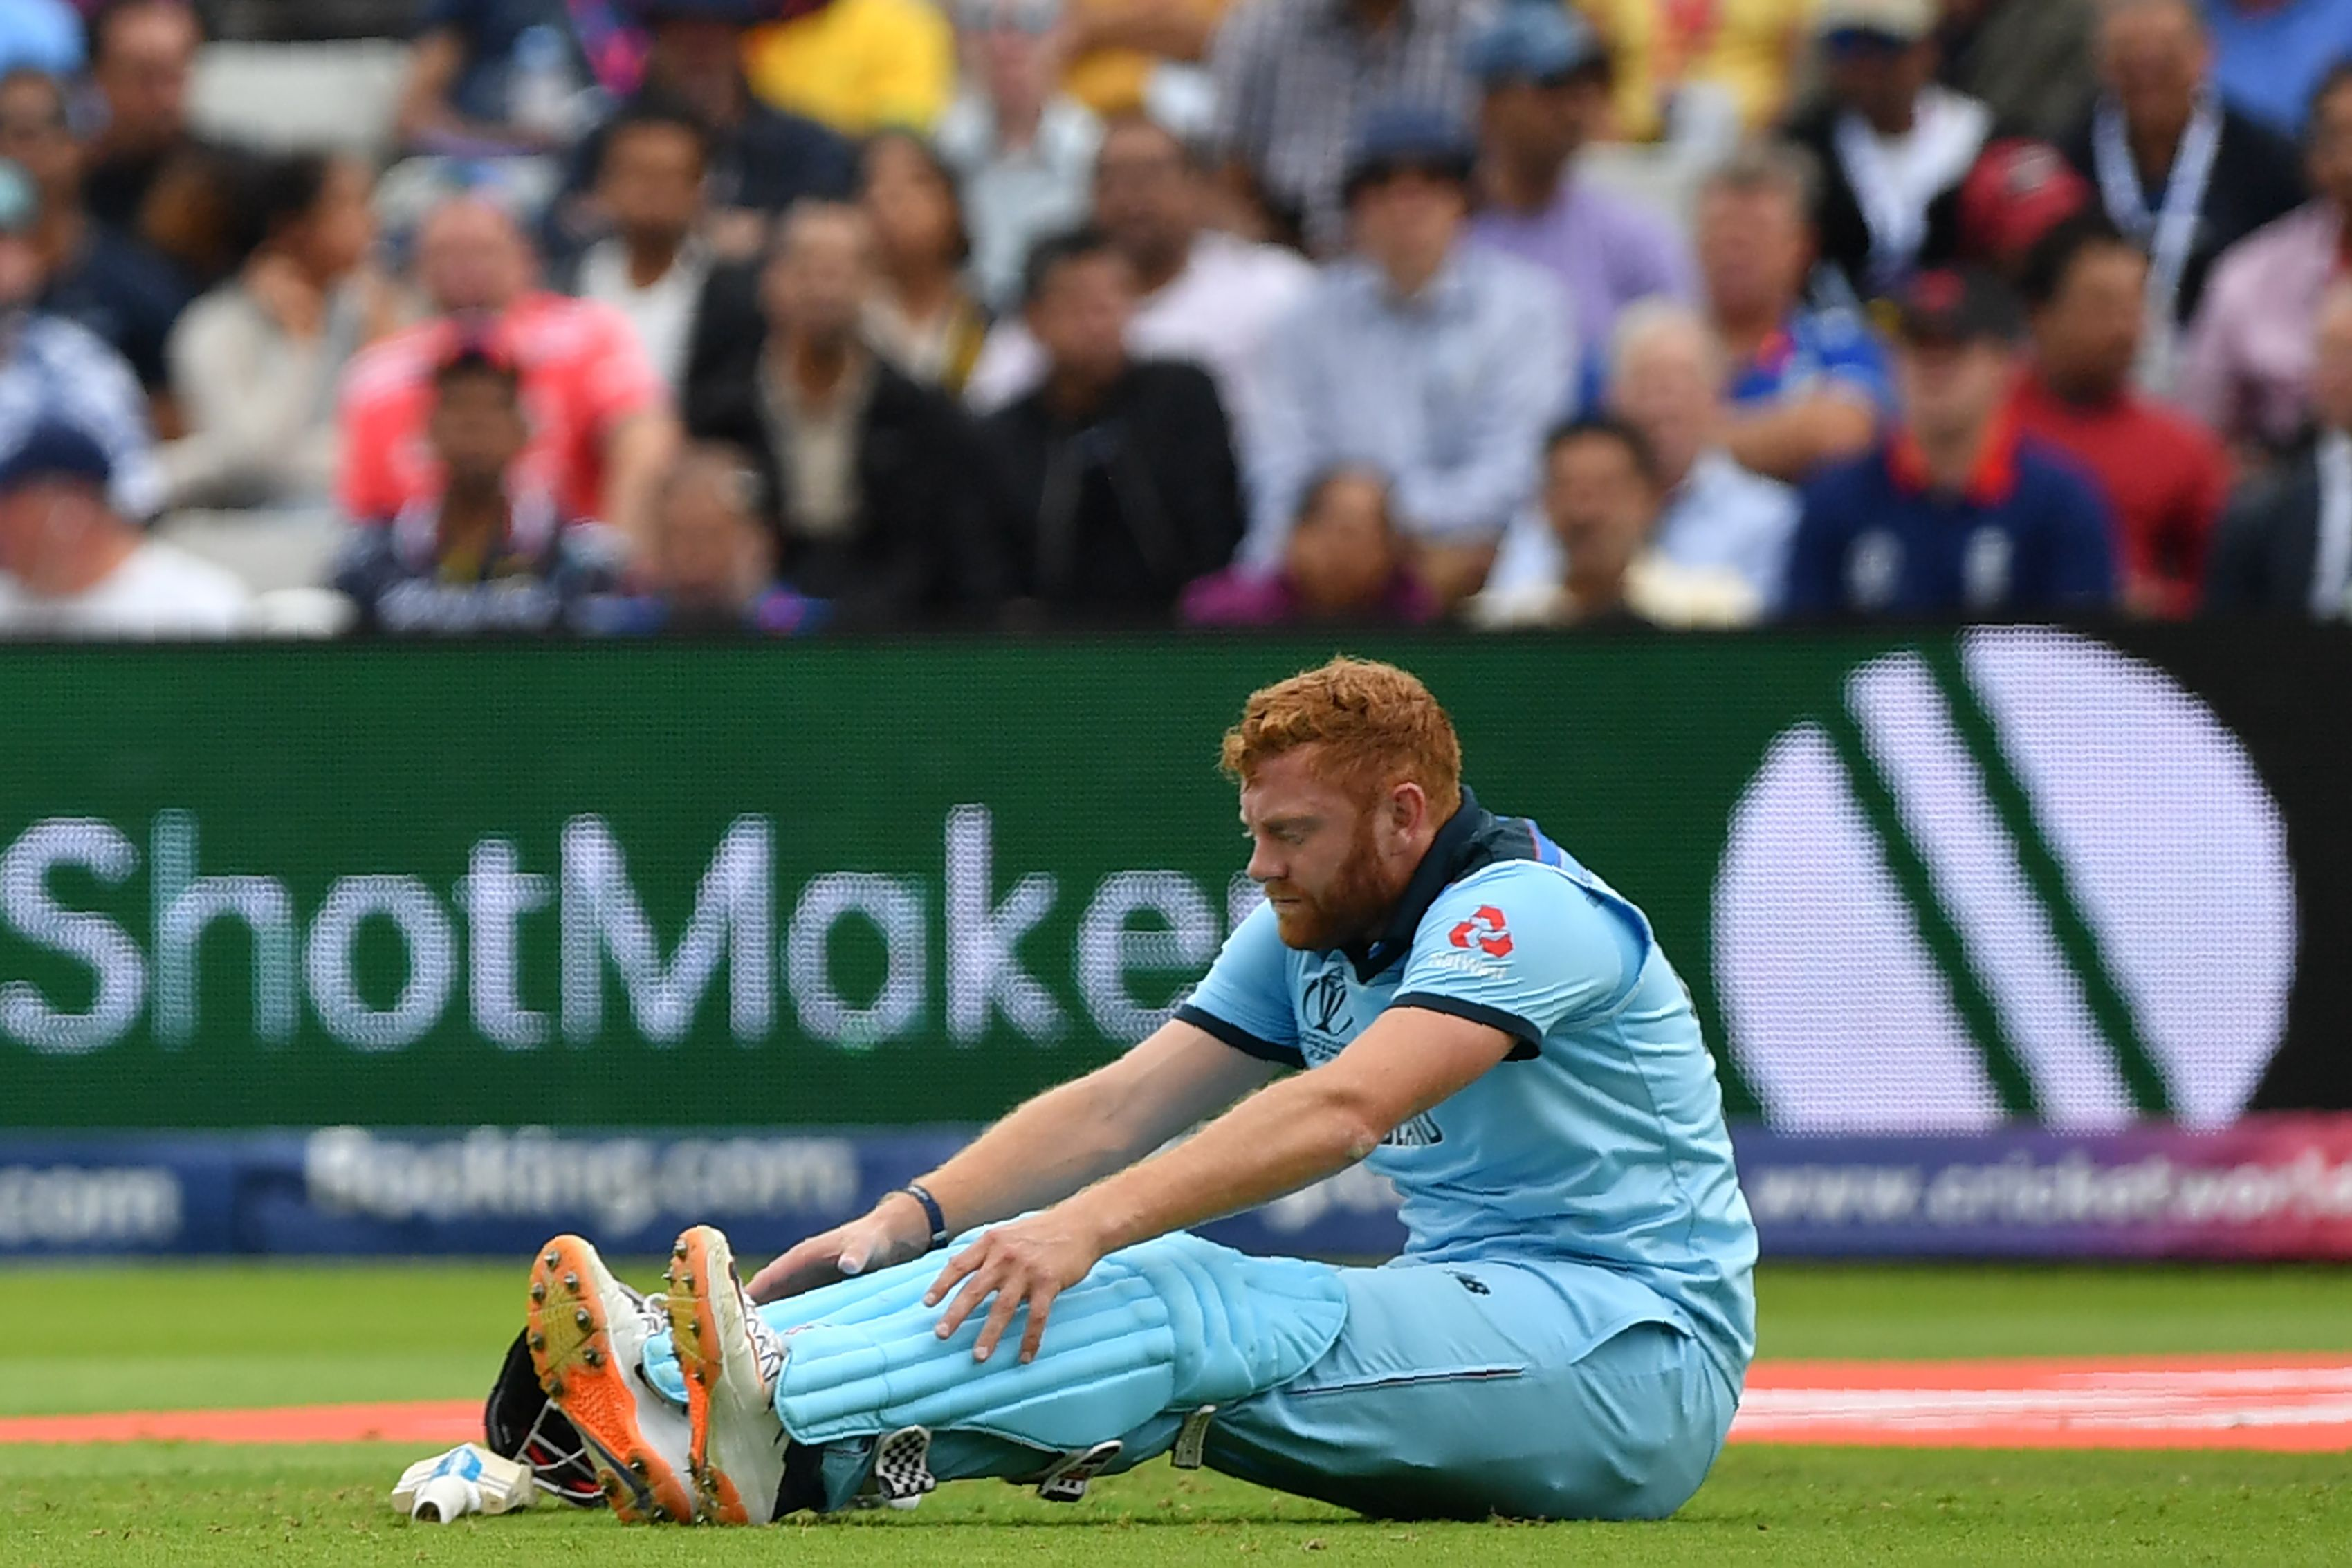 Jonny Bairstow sits on the field as he nurses an injury. Photo: AFP